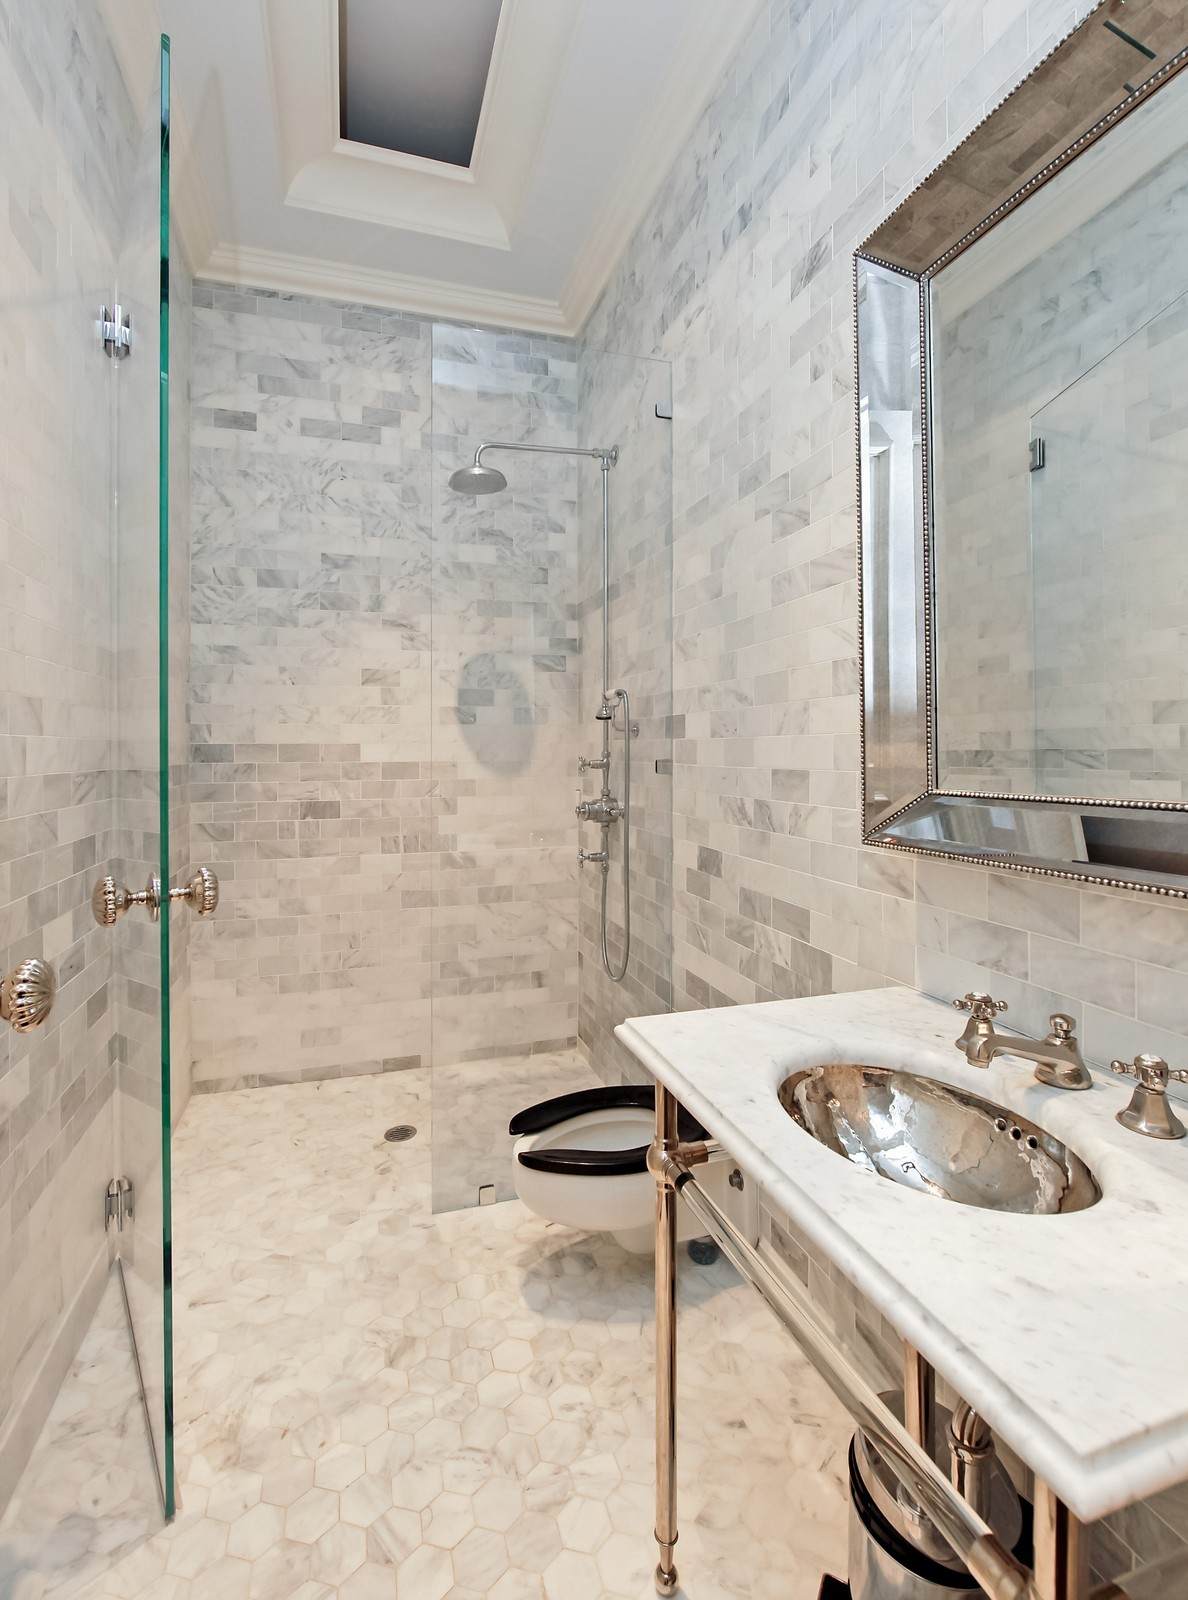 Real Estate Photography - 1424 W Ohio St, Chicago, IL, 60622 - Bathroom